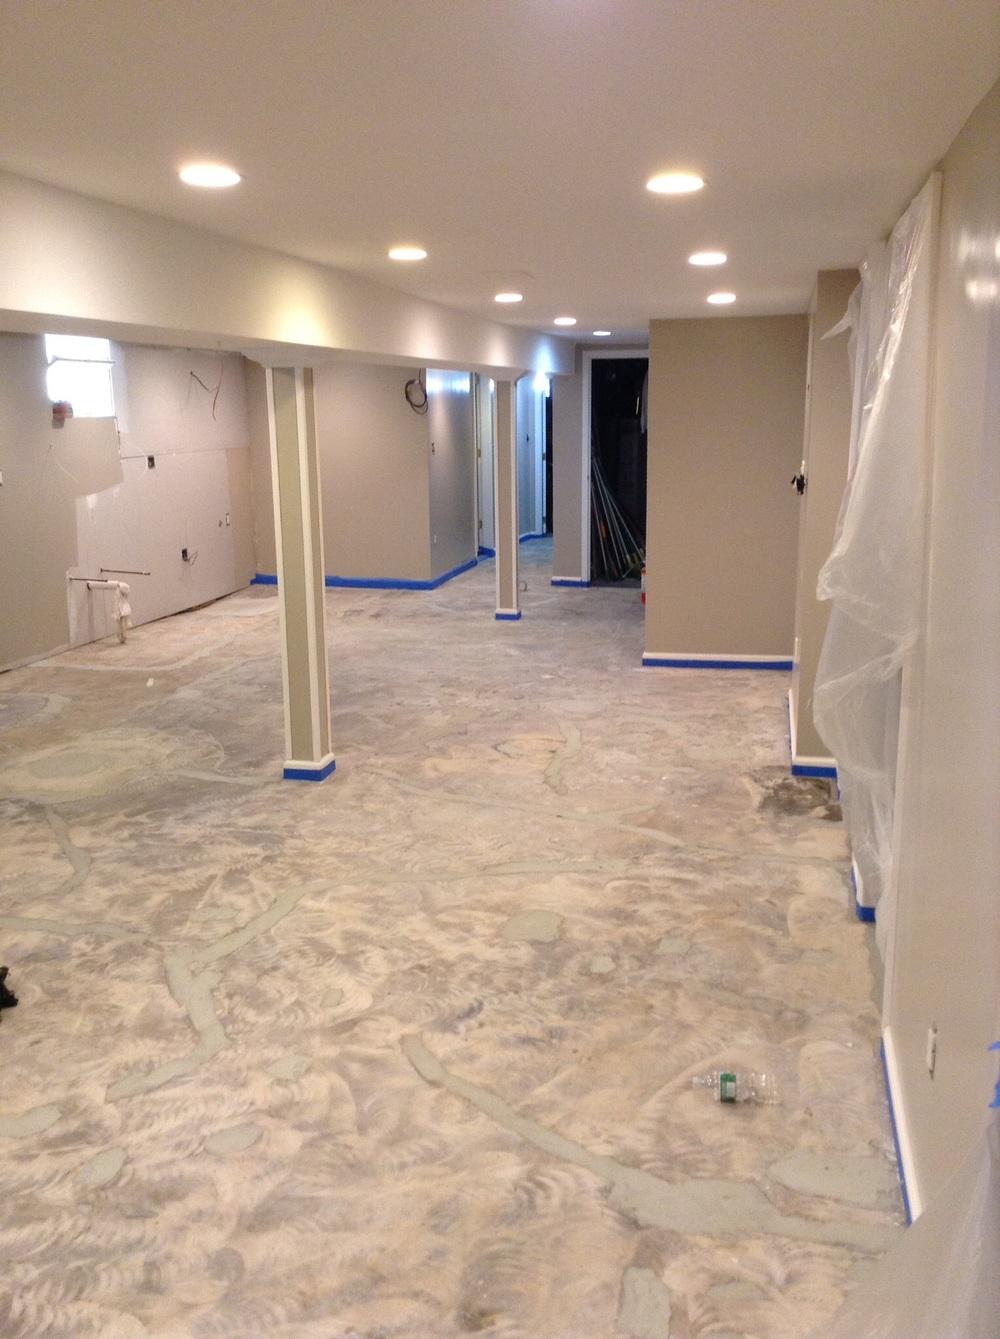 Epoxy Basement Floor Covering. Epoxy Flooring Basement Basement Floor With Decorative Chip Epoxy Flooring T